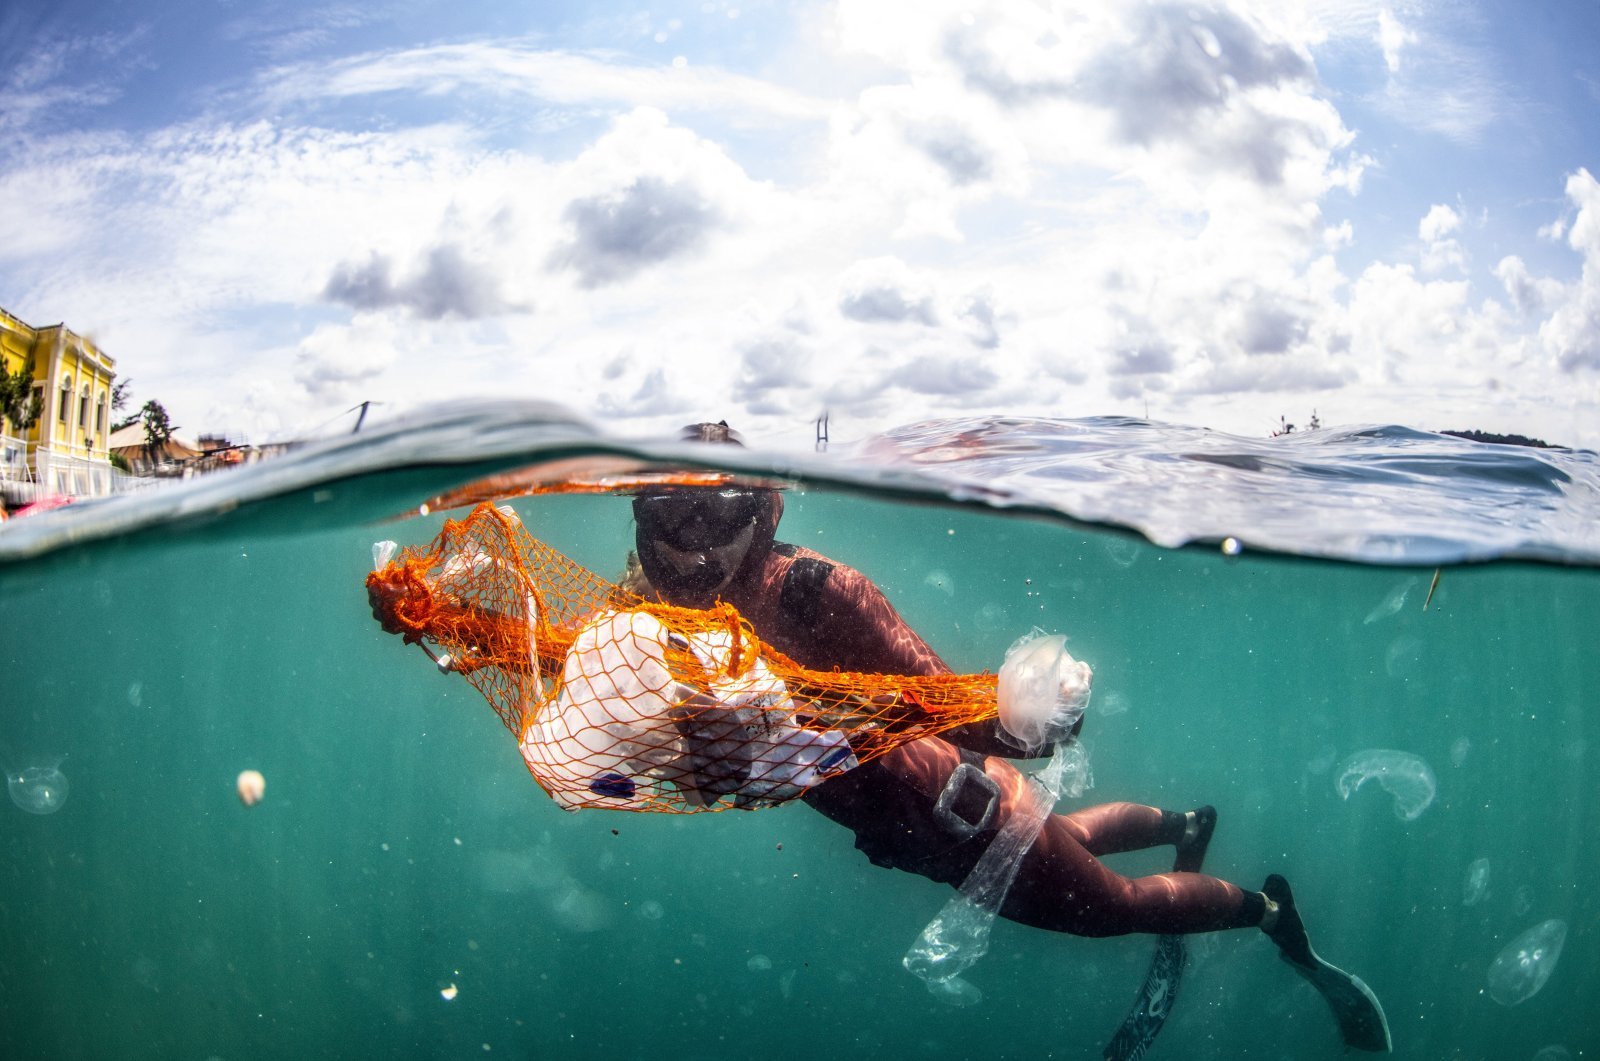 World record holder Turkish free diver Şahika Encümen dives into the Marmara Sea to promote the Zero Waste project, Istanbul, Turkey, July 1, 2020. (AA Photo)